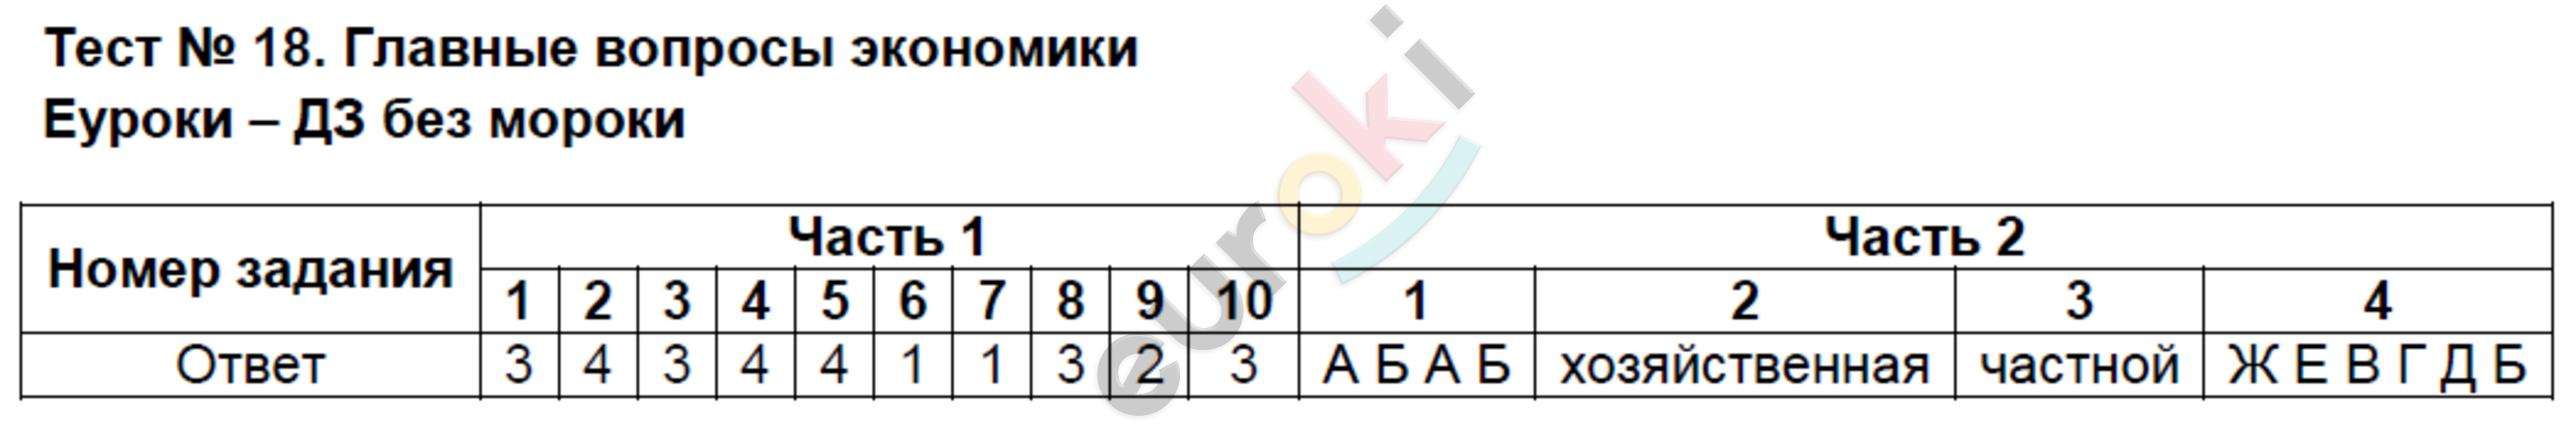 гдз по тестам по обществознанию 8 класс краюшкина с.в